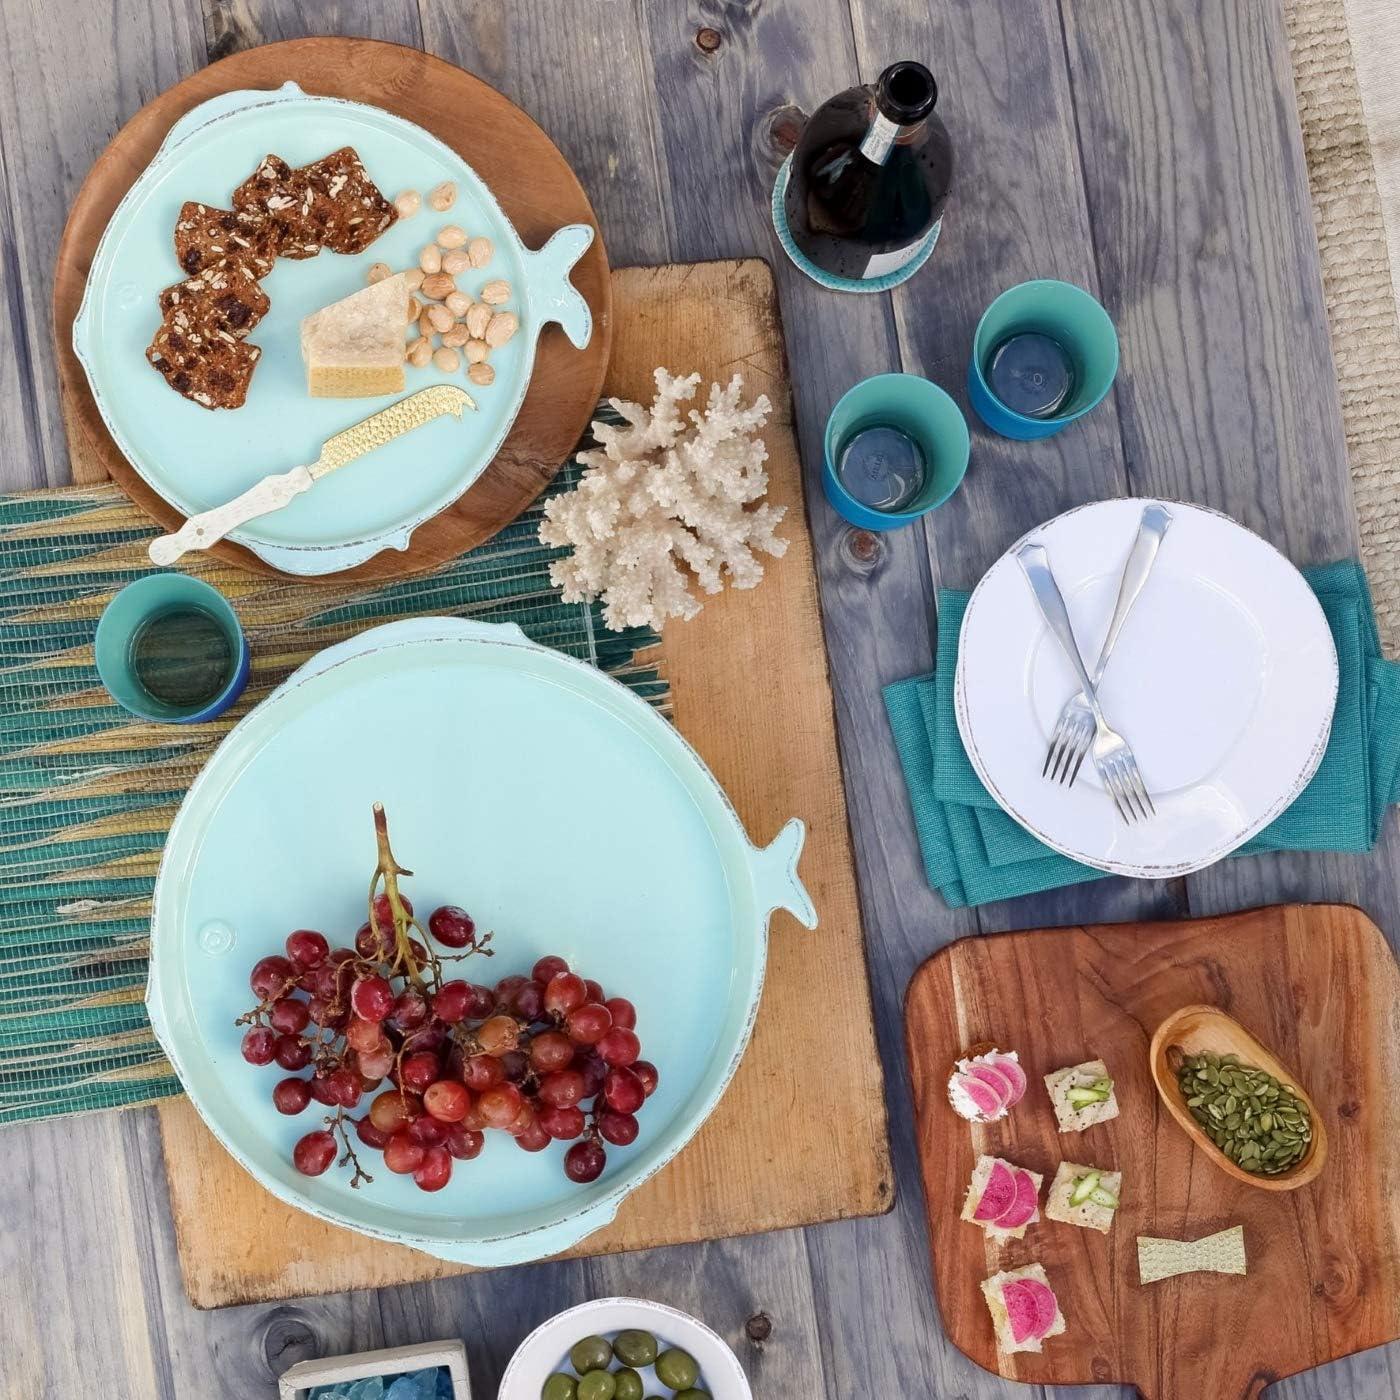 Amazon.com: Vietri Lastra Vajilla de pescado: Kitchen & Dining